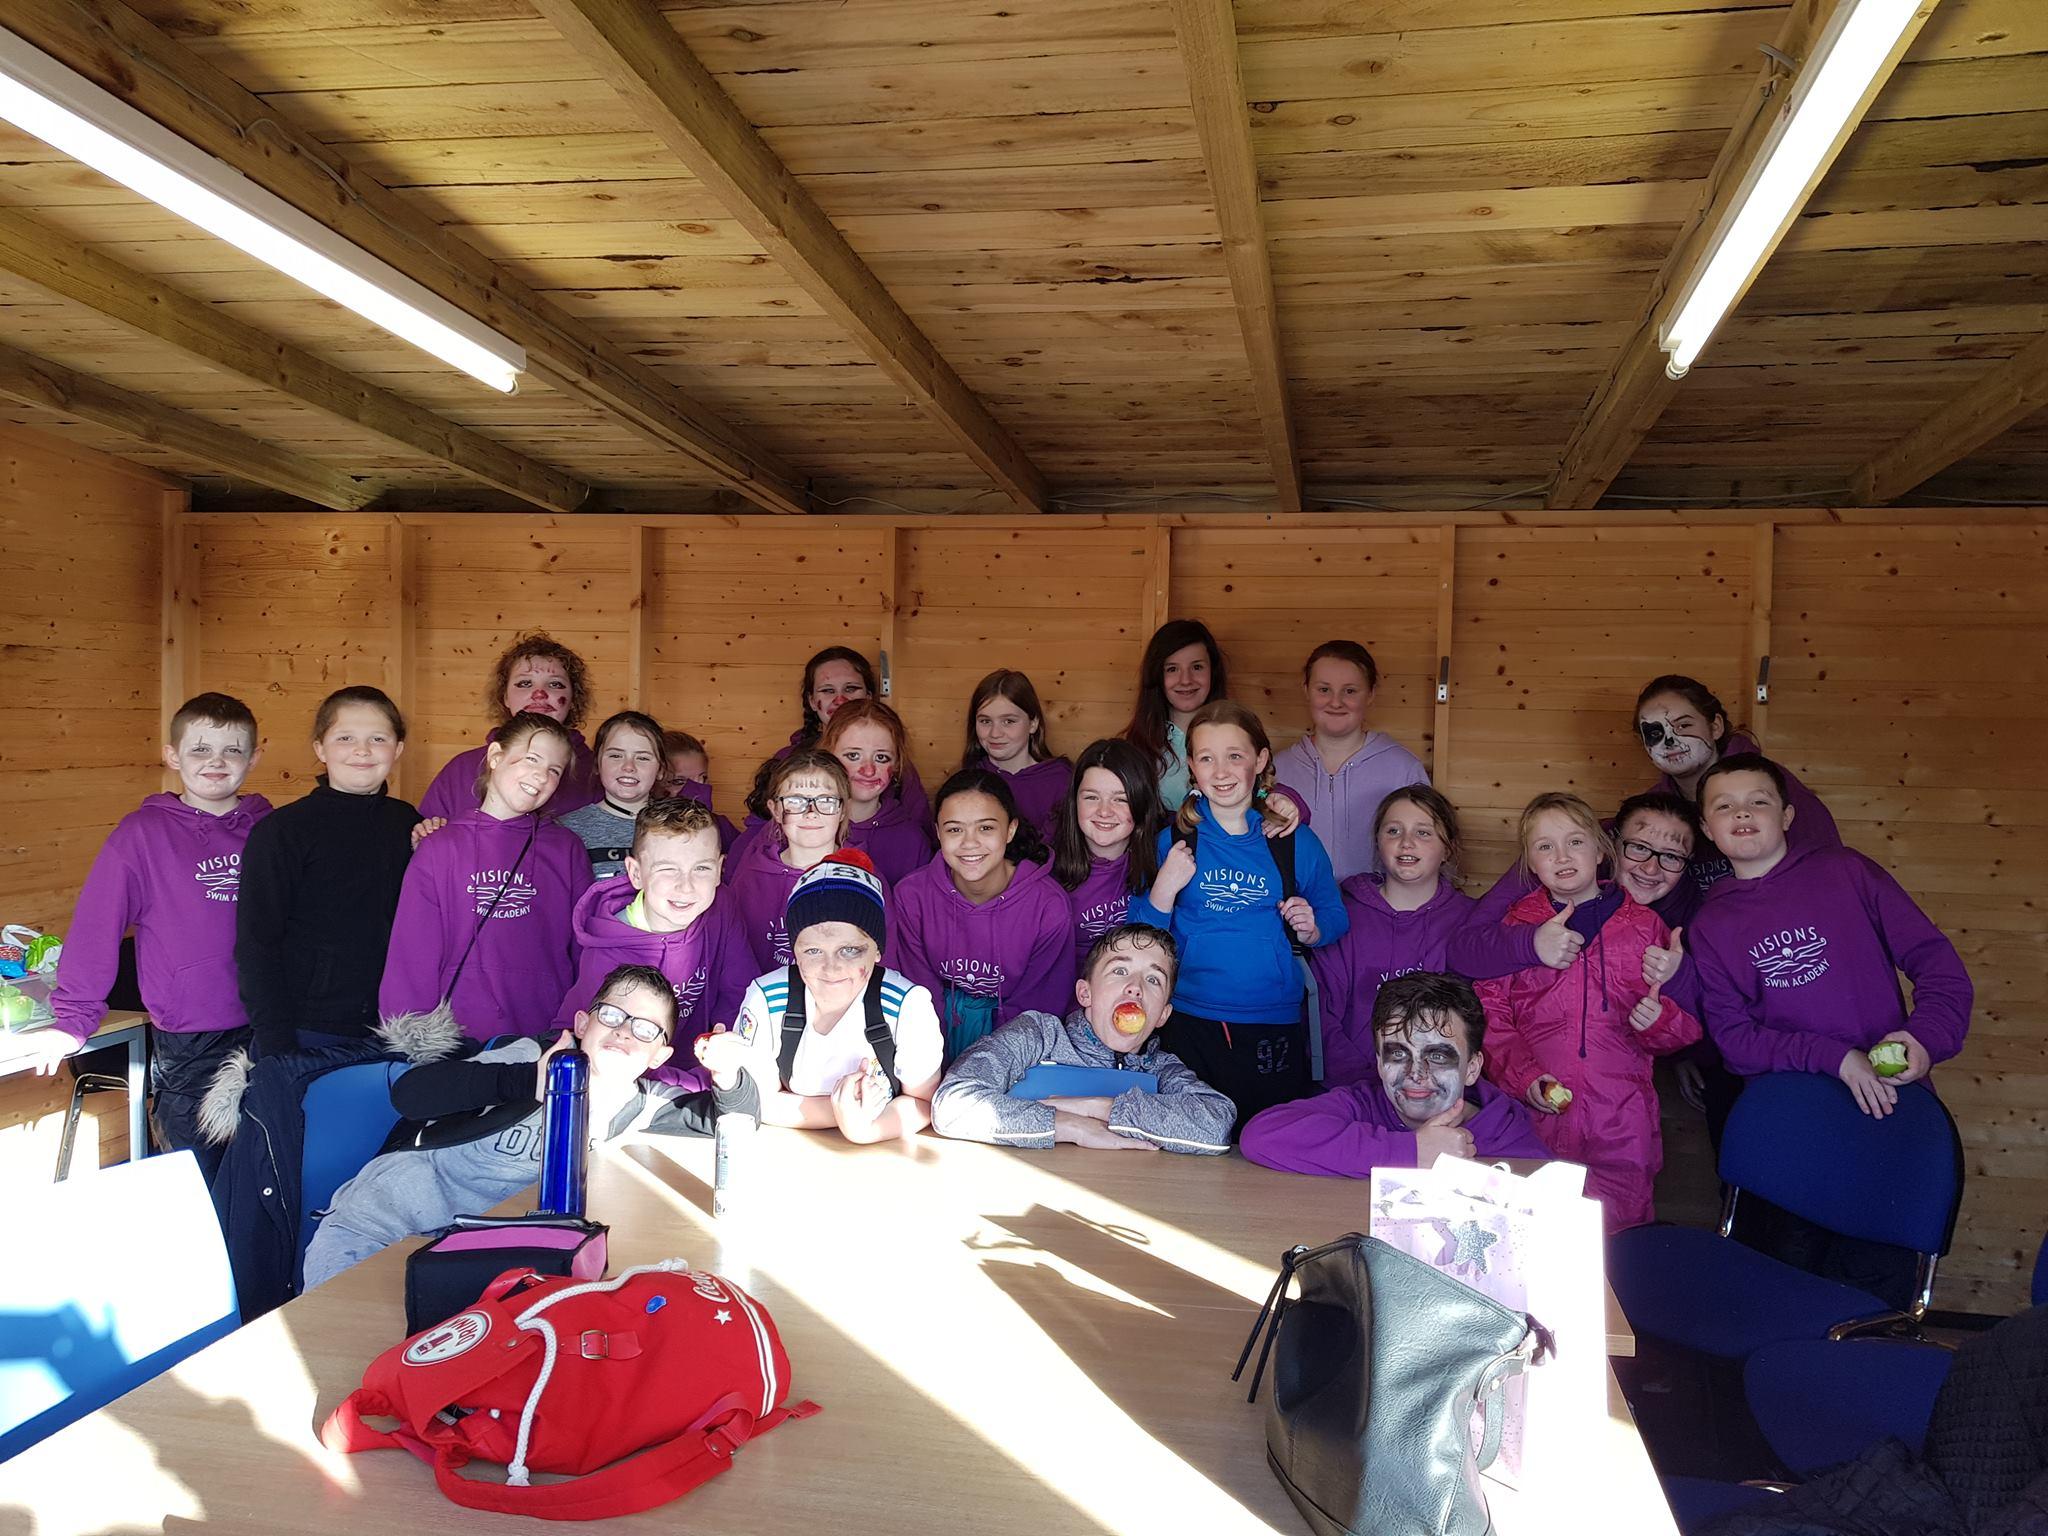 Group at newmills